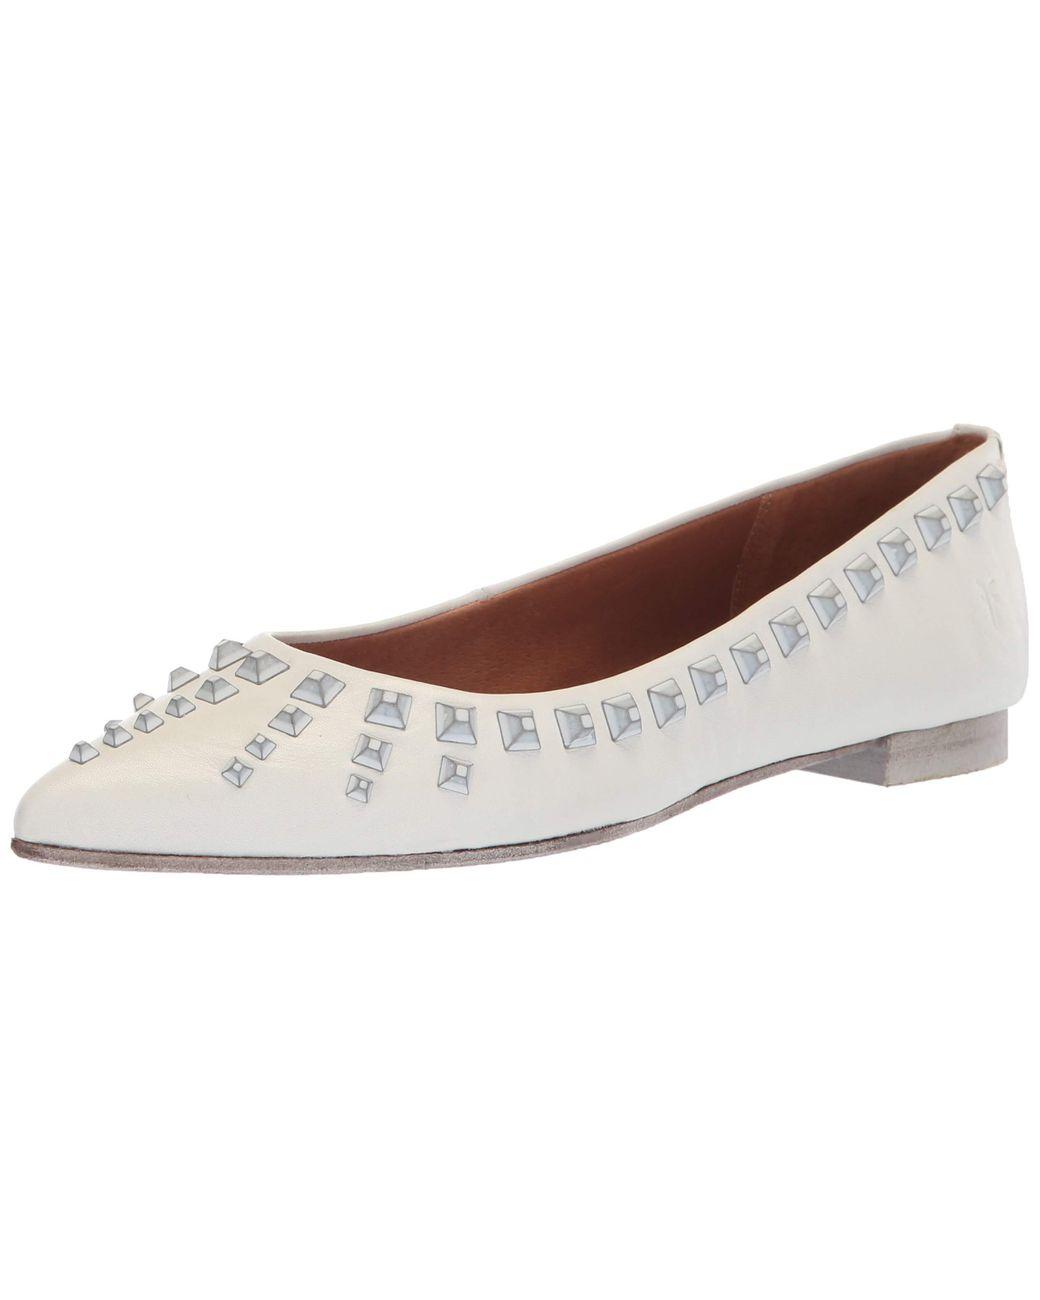 Frye Womens Sienna Deco Stud Ballet Flat